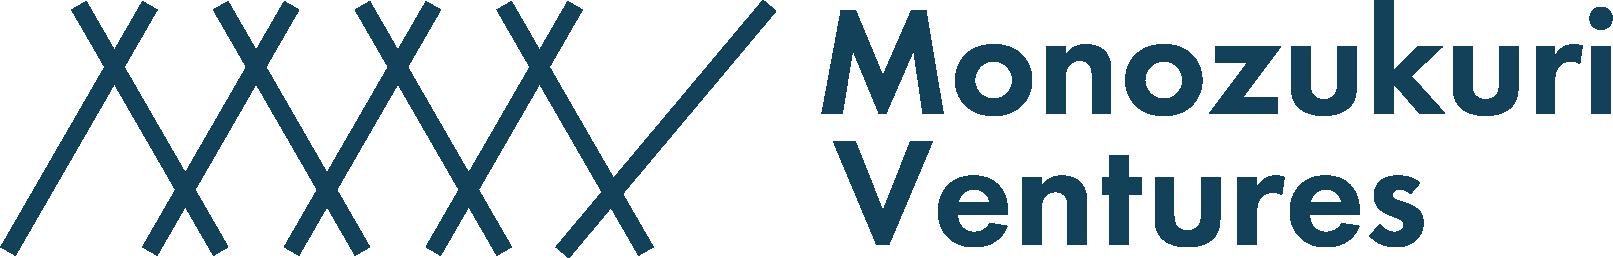 mzv logo